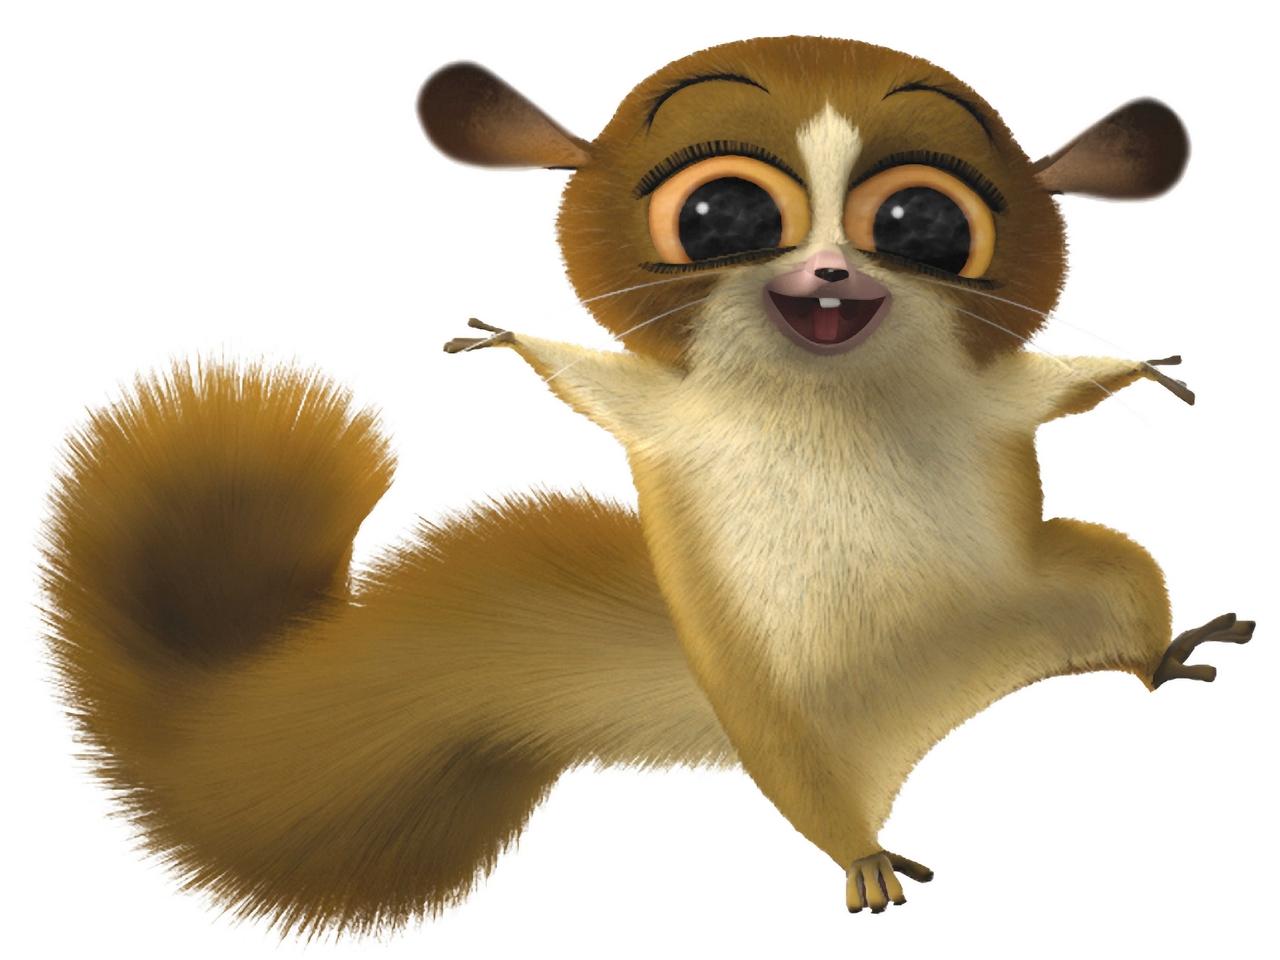 http://4.bp.blogspot.com/-xmxK9d17j74/Tb-p4qsuxVI/AAAAAAAAAA0/bykblgaV0Xk/s1600/Madagascar2.jpg